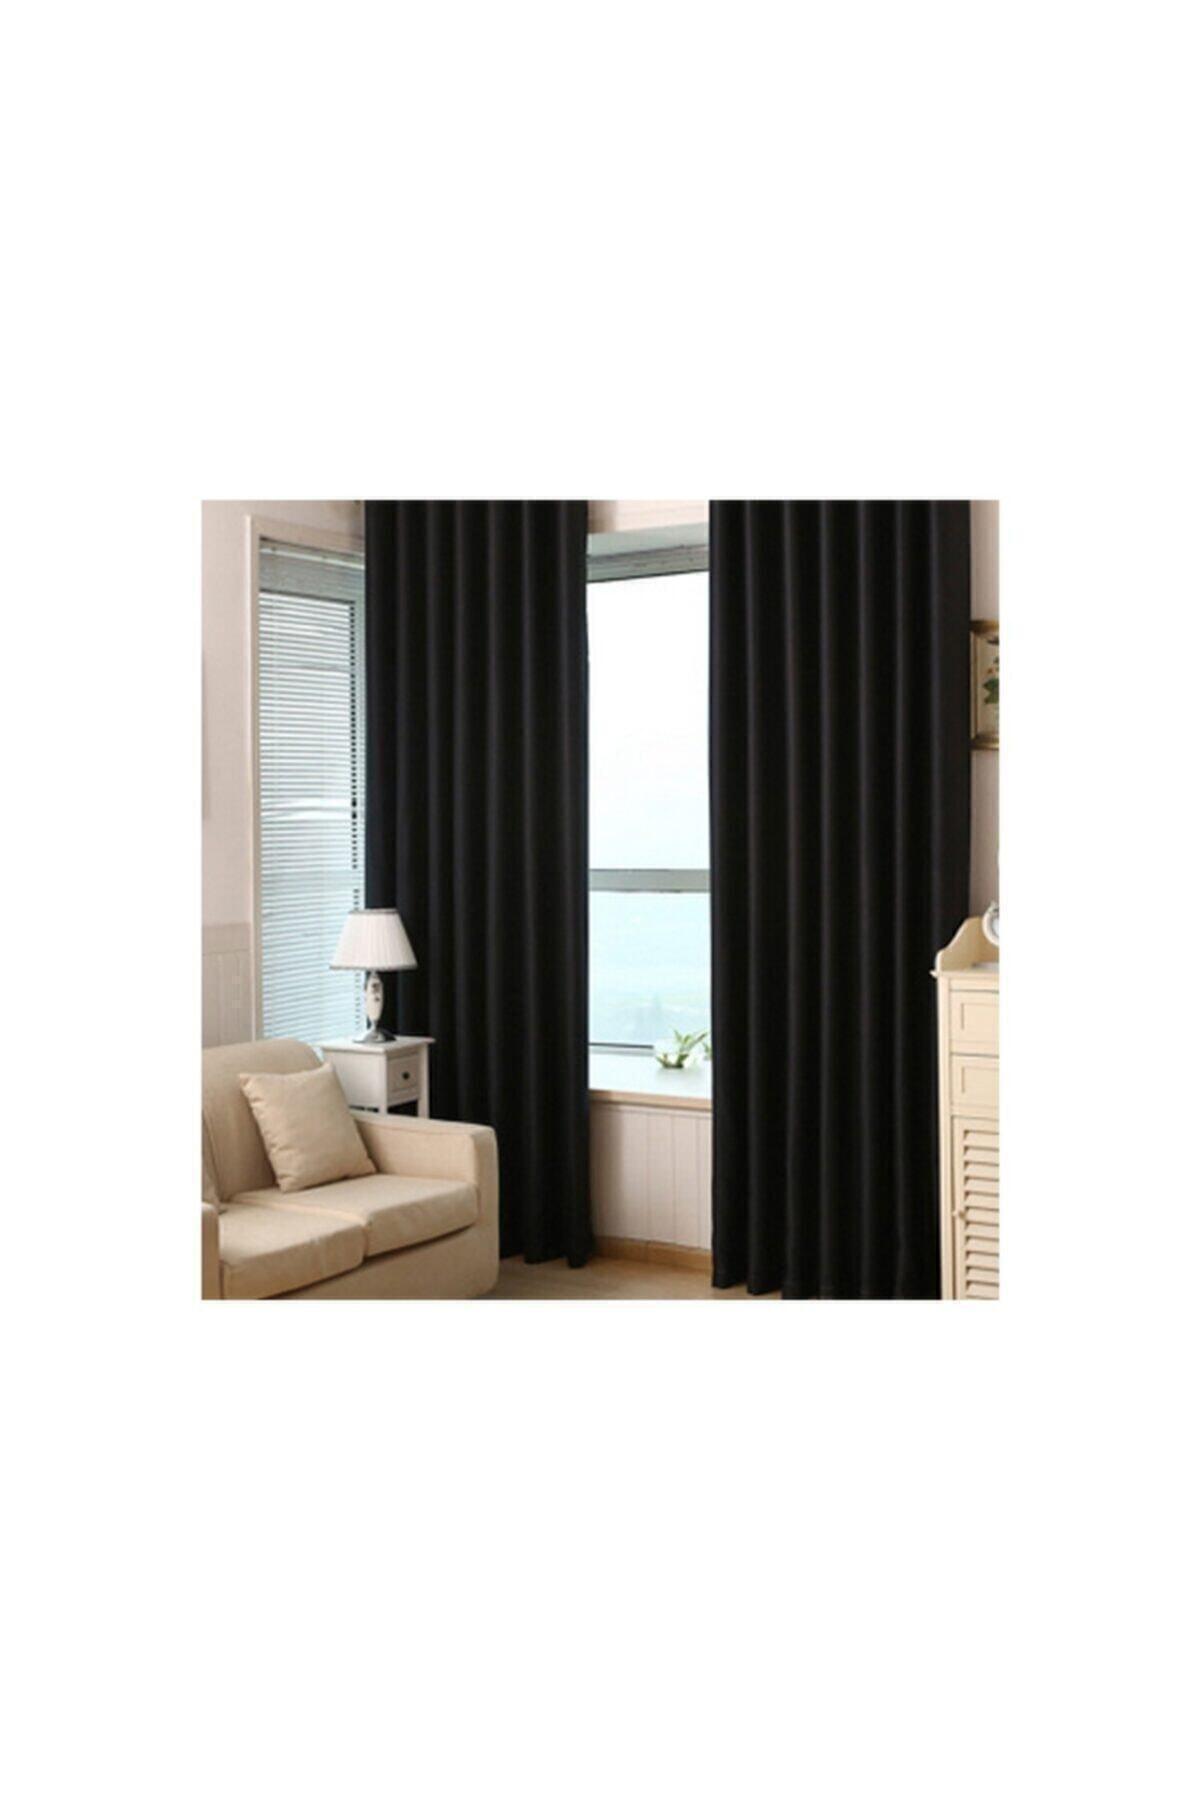 Blackout Karartma Güneşlik Perde Pilesiz Siyah Lcrblck 100x200 cm